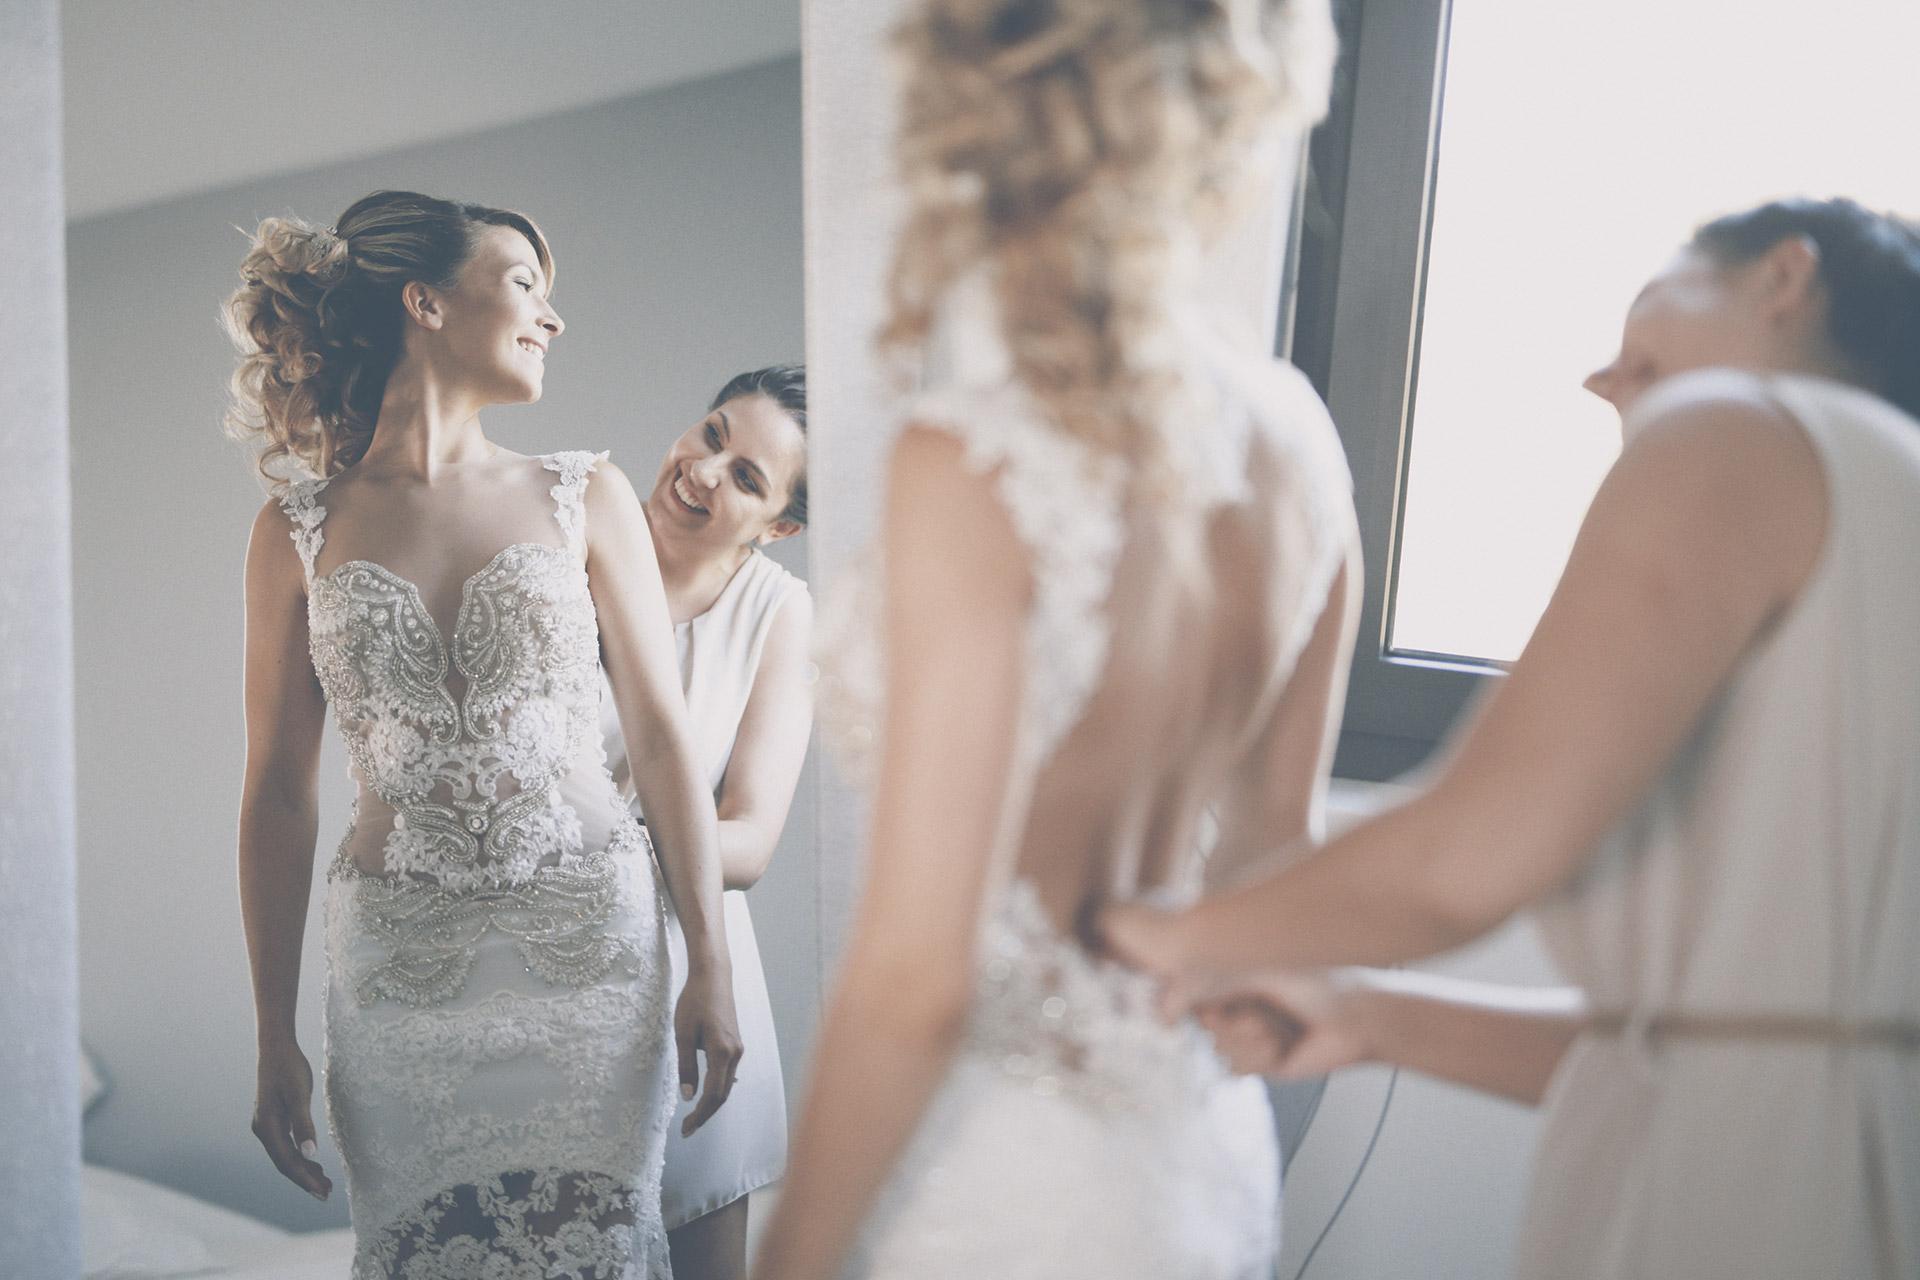 Jelena & Jurica wedding story